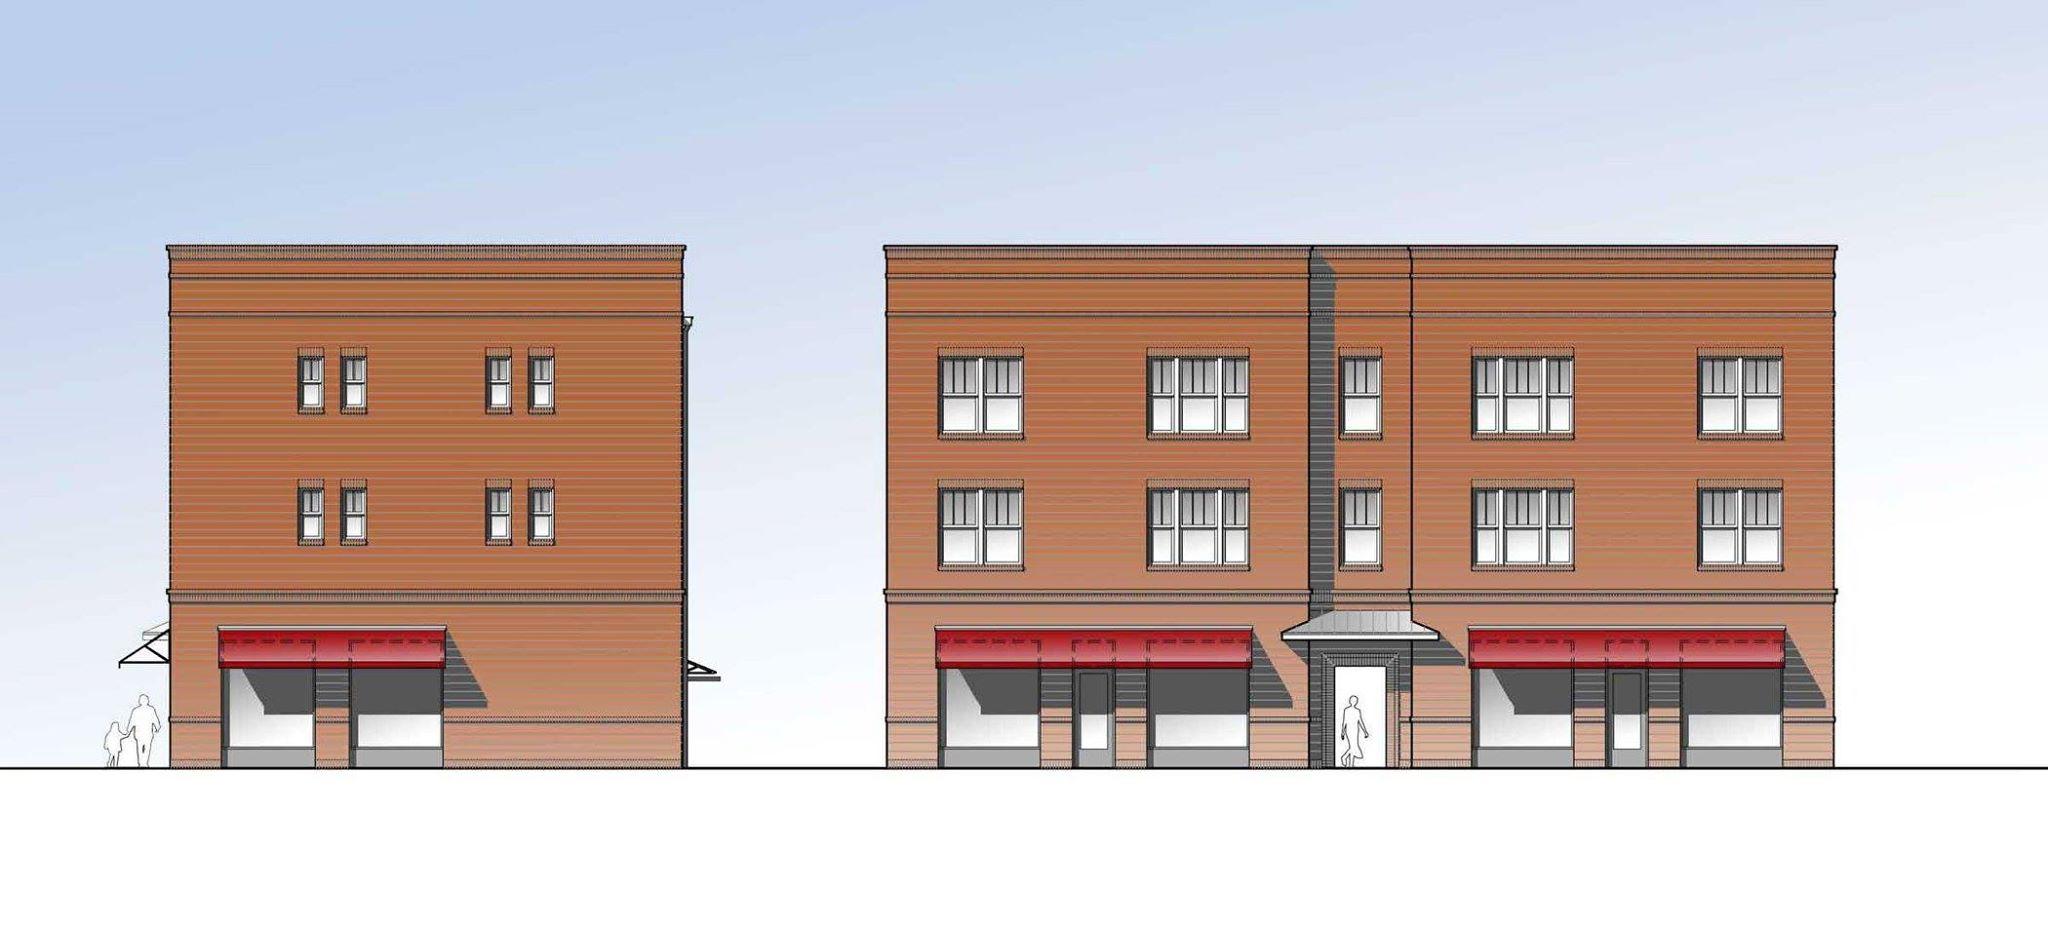 Salimos de la jungla renewing church street south housing for Two story elevator cost